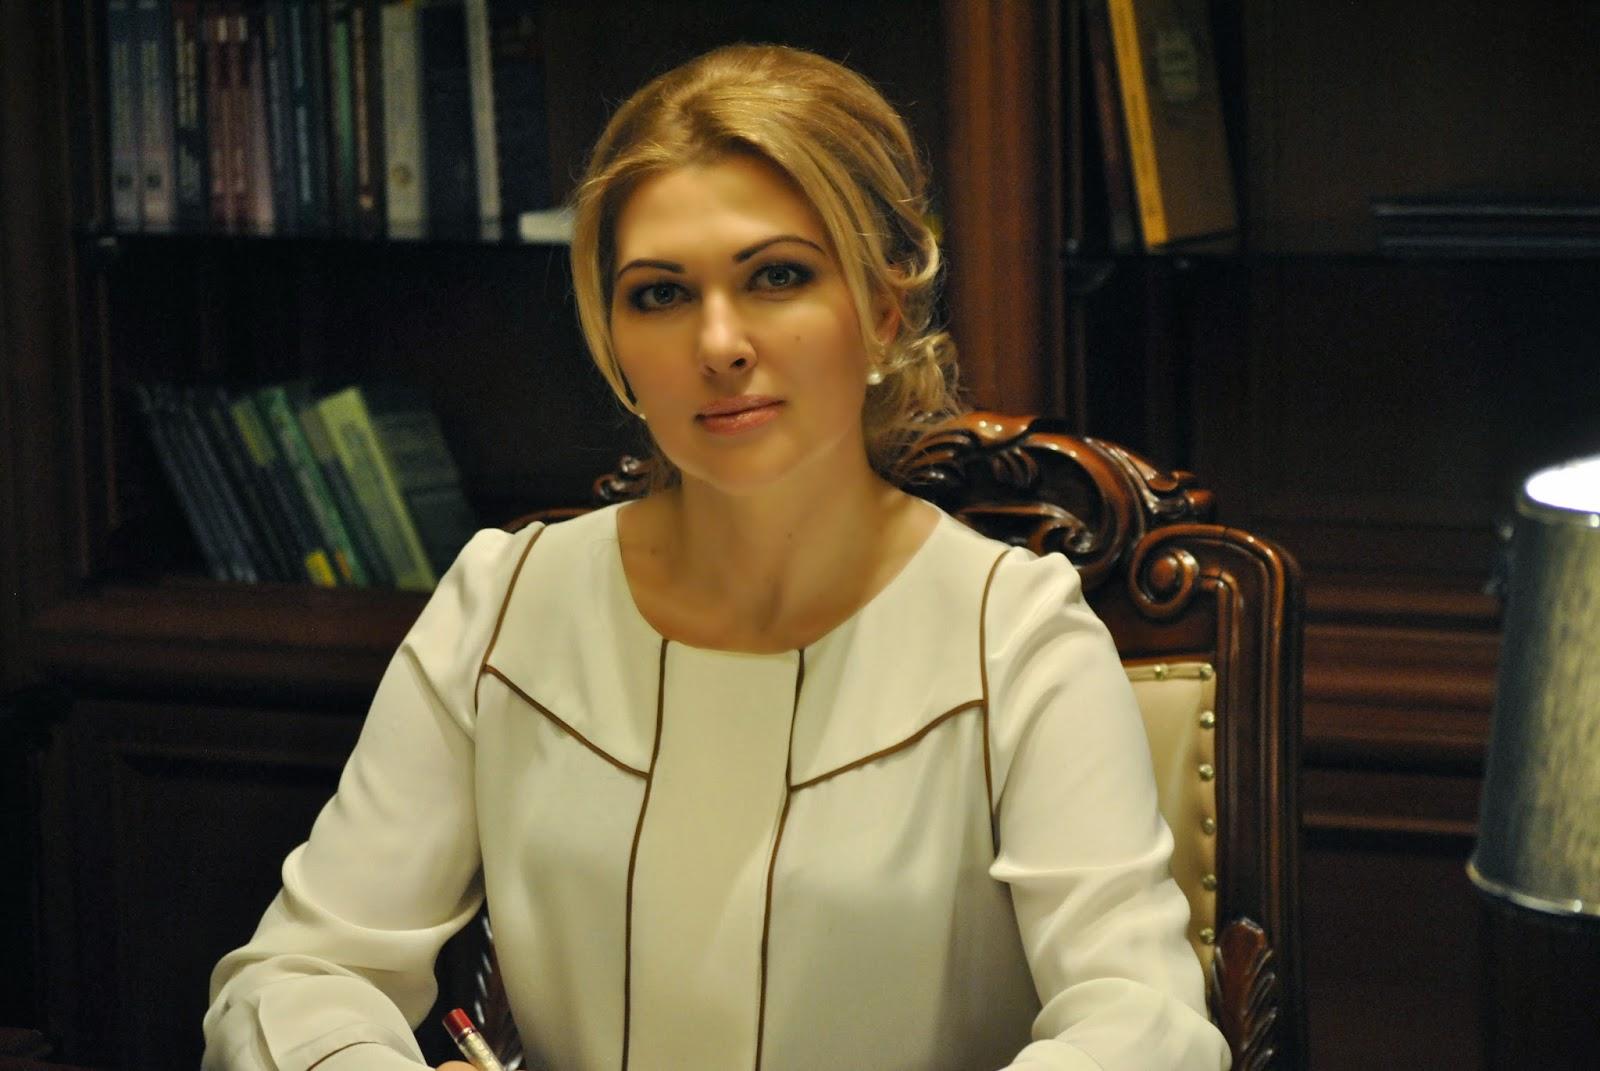 Гламурна одеська суддя задекларувала п'ять шуб, два «Ролекса» та багато золота